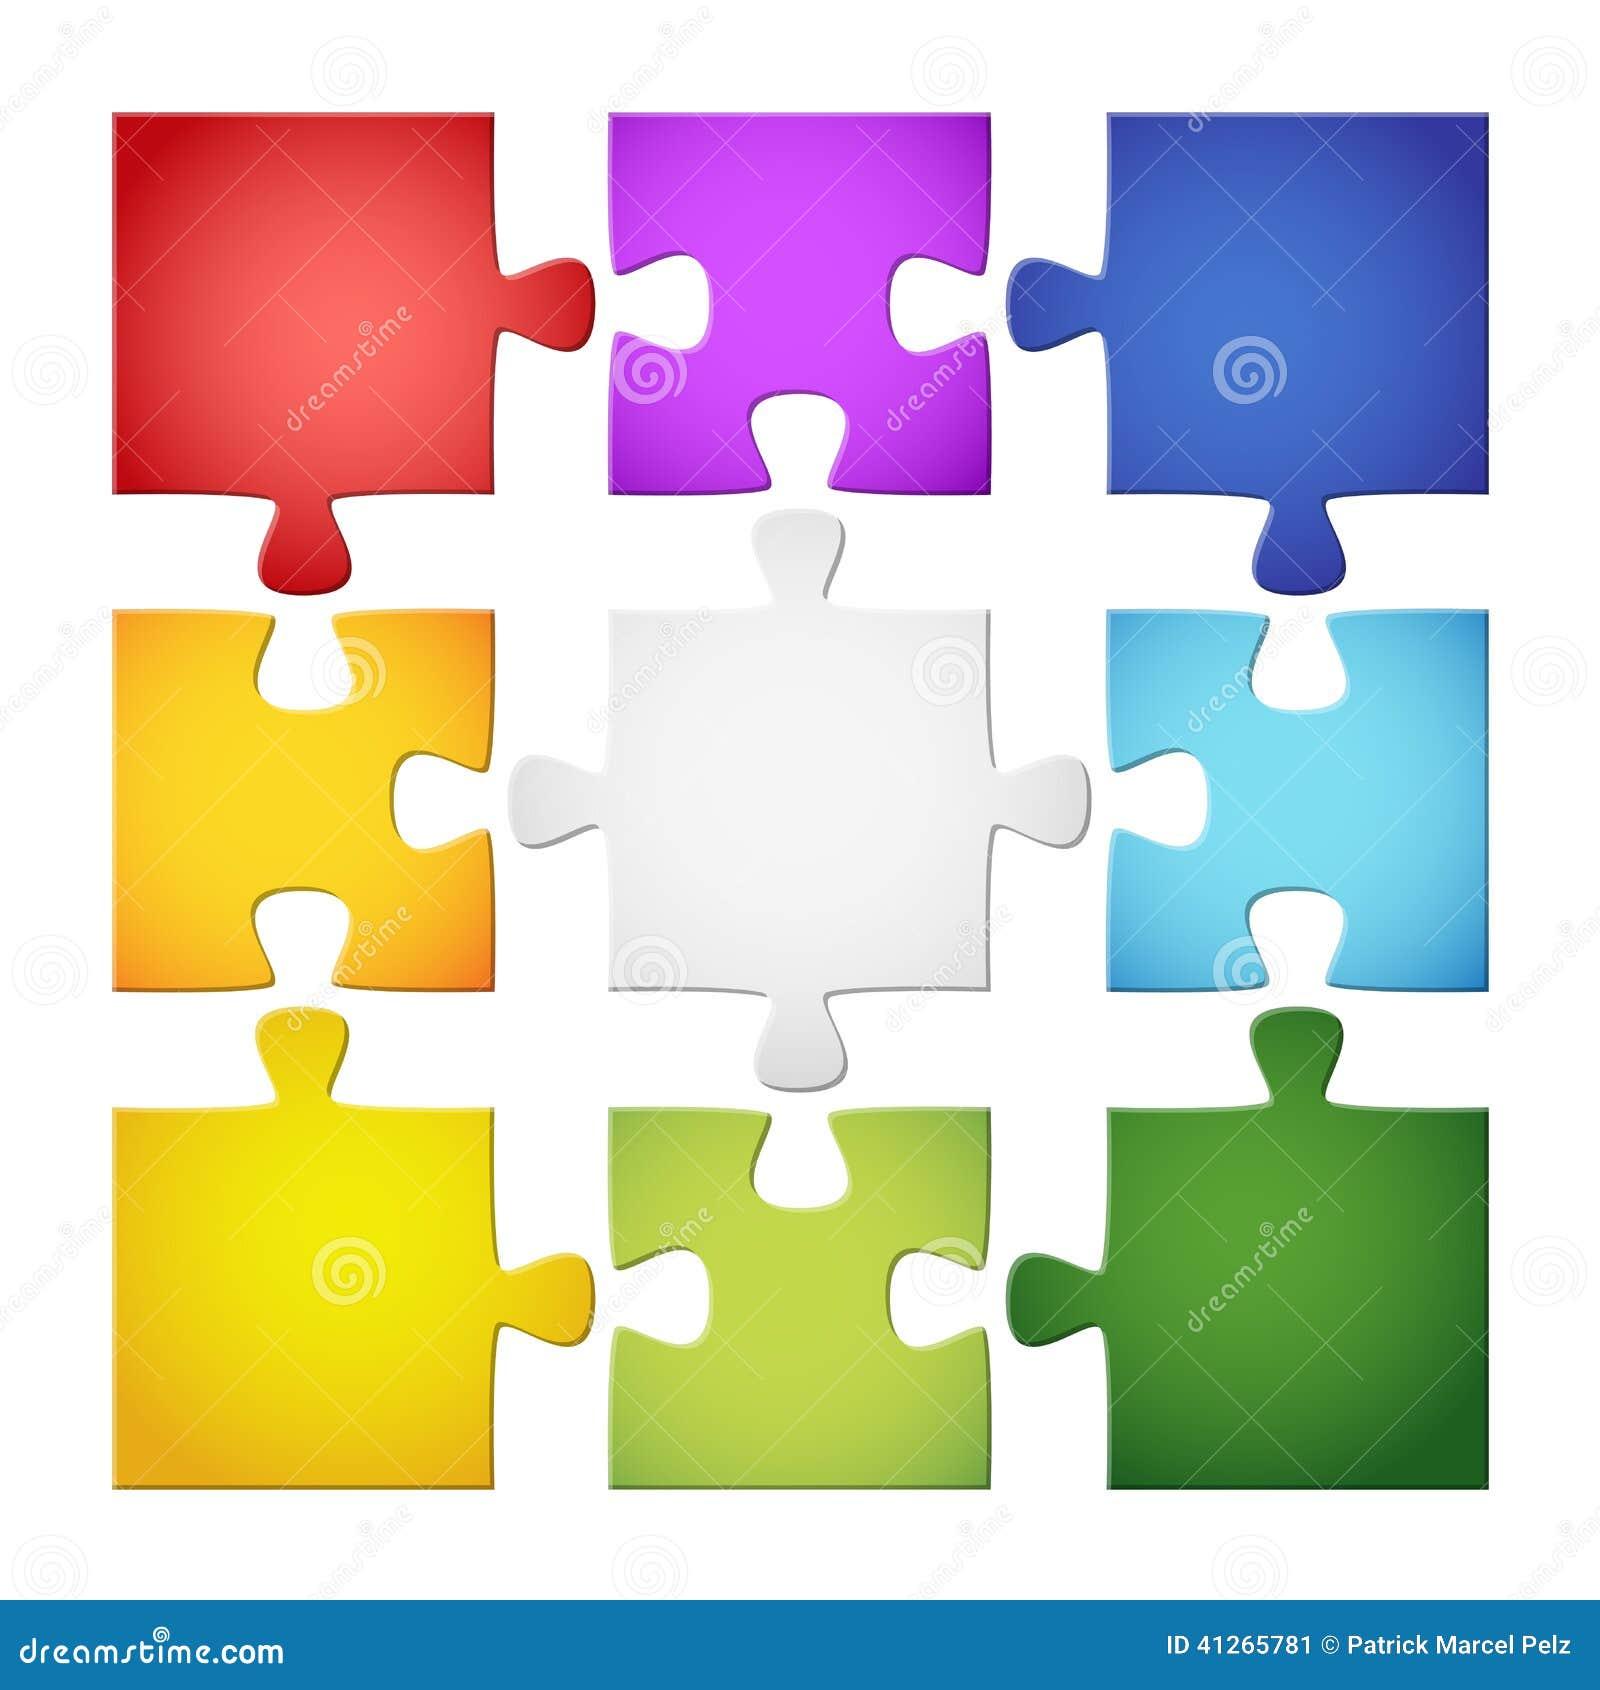 9 colored puzzle pieces